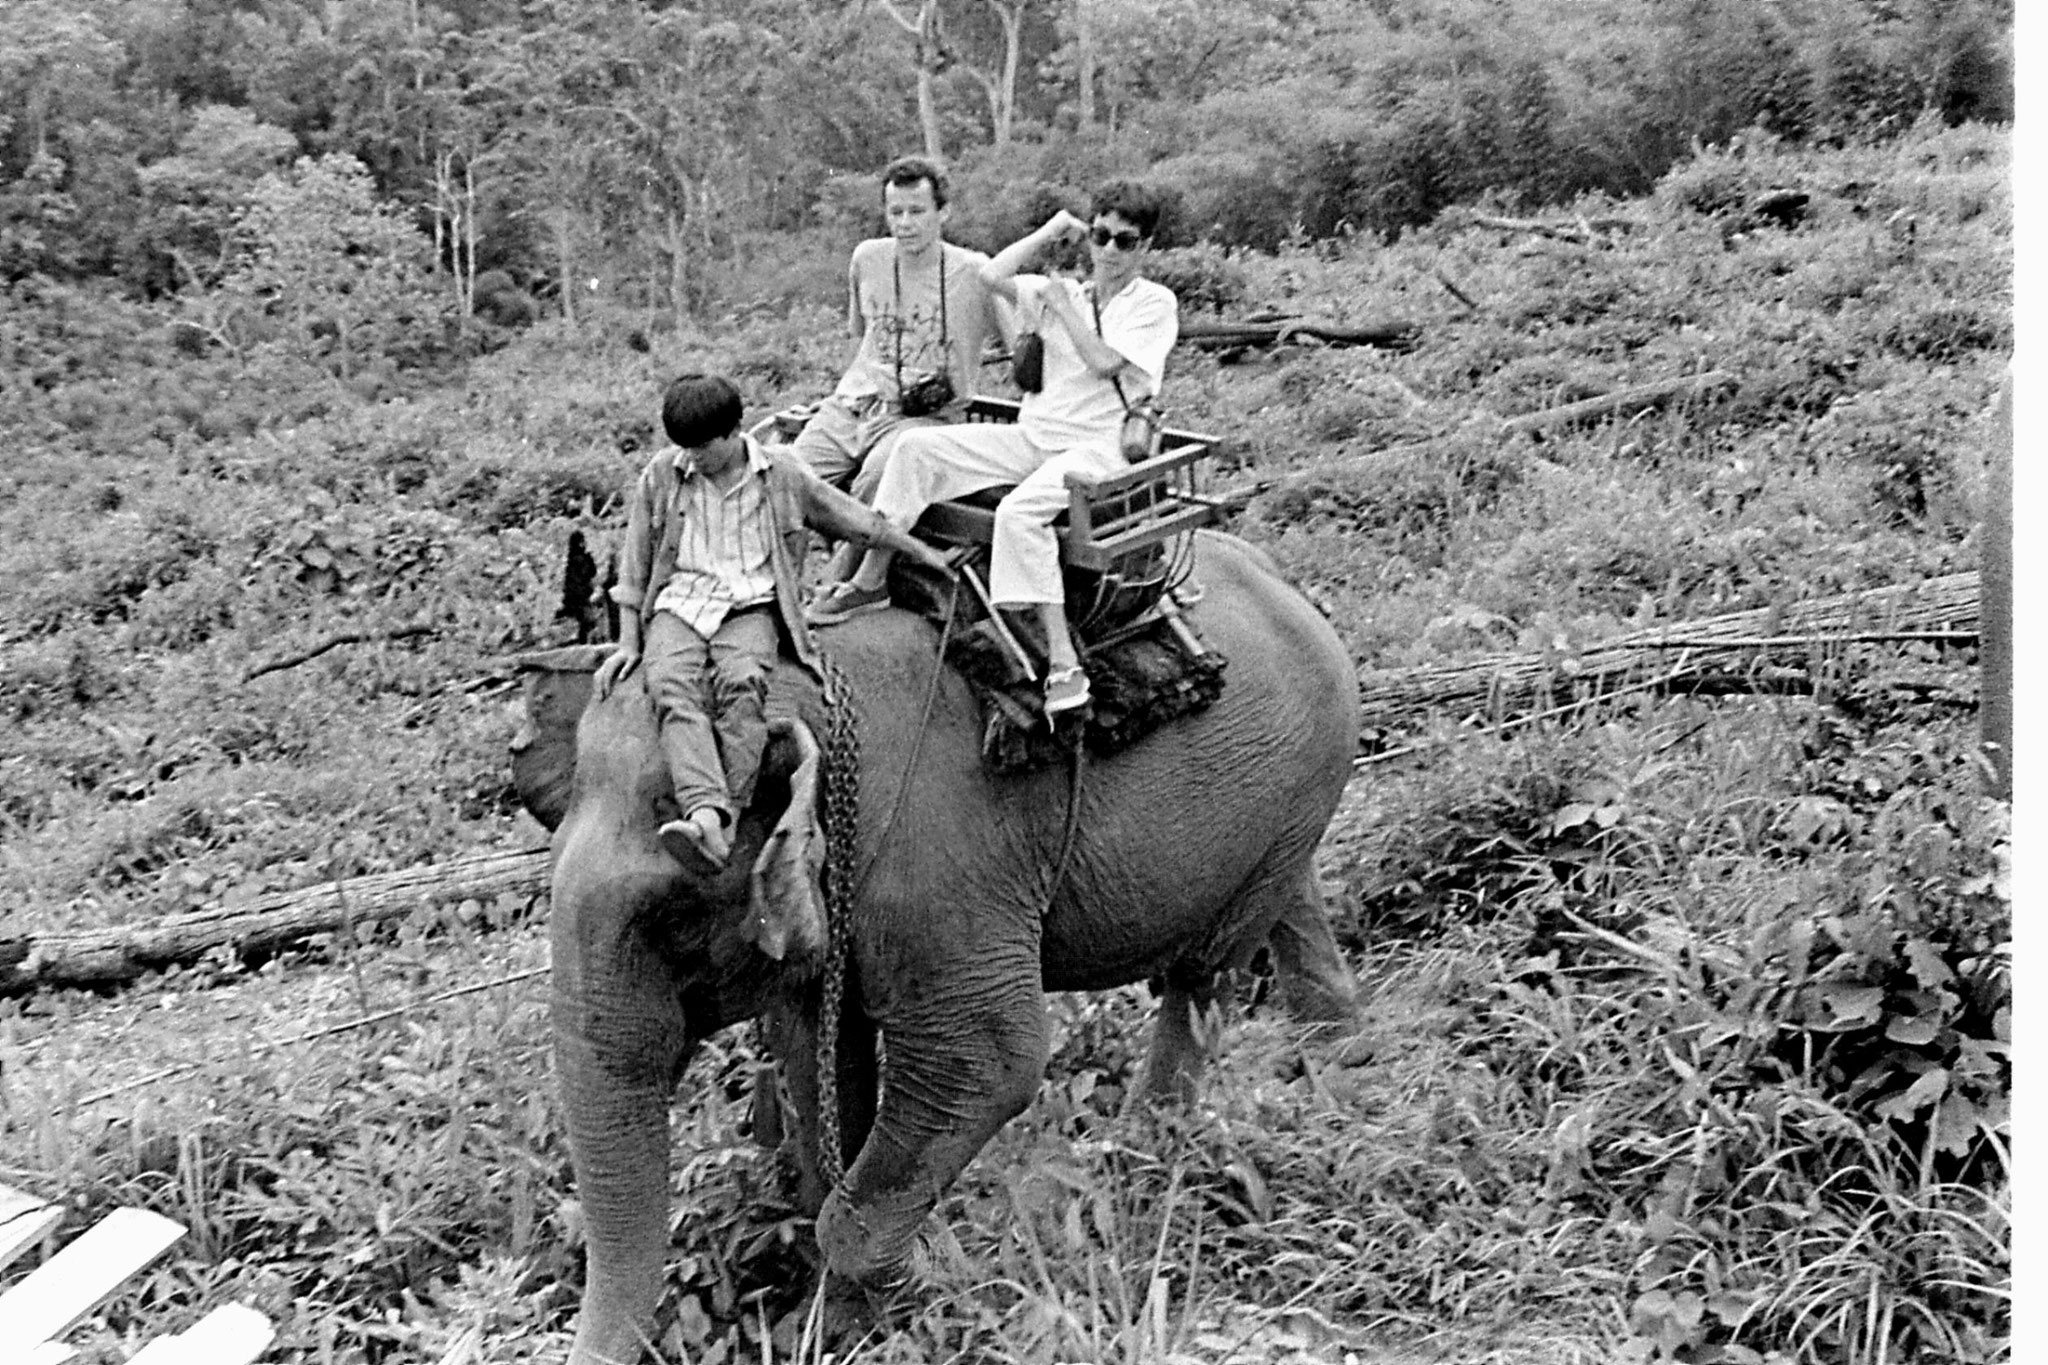 13/6/1990: 30: Last day of Trek, on elephant